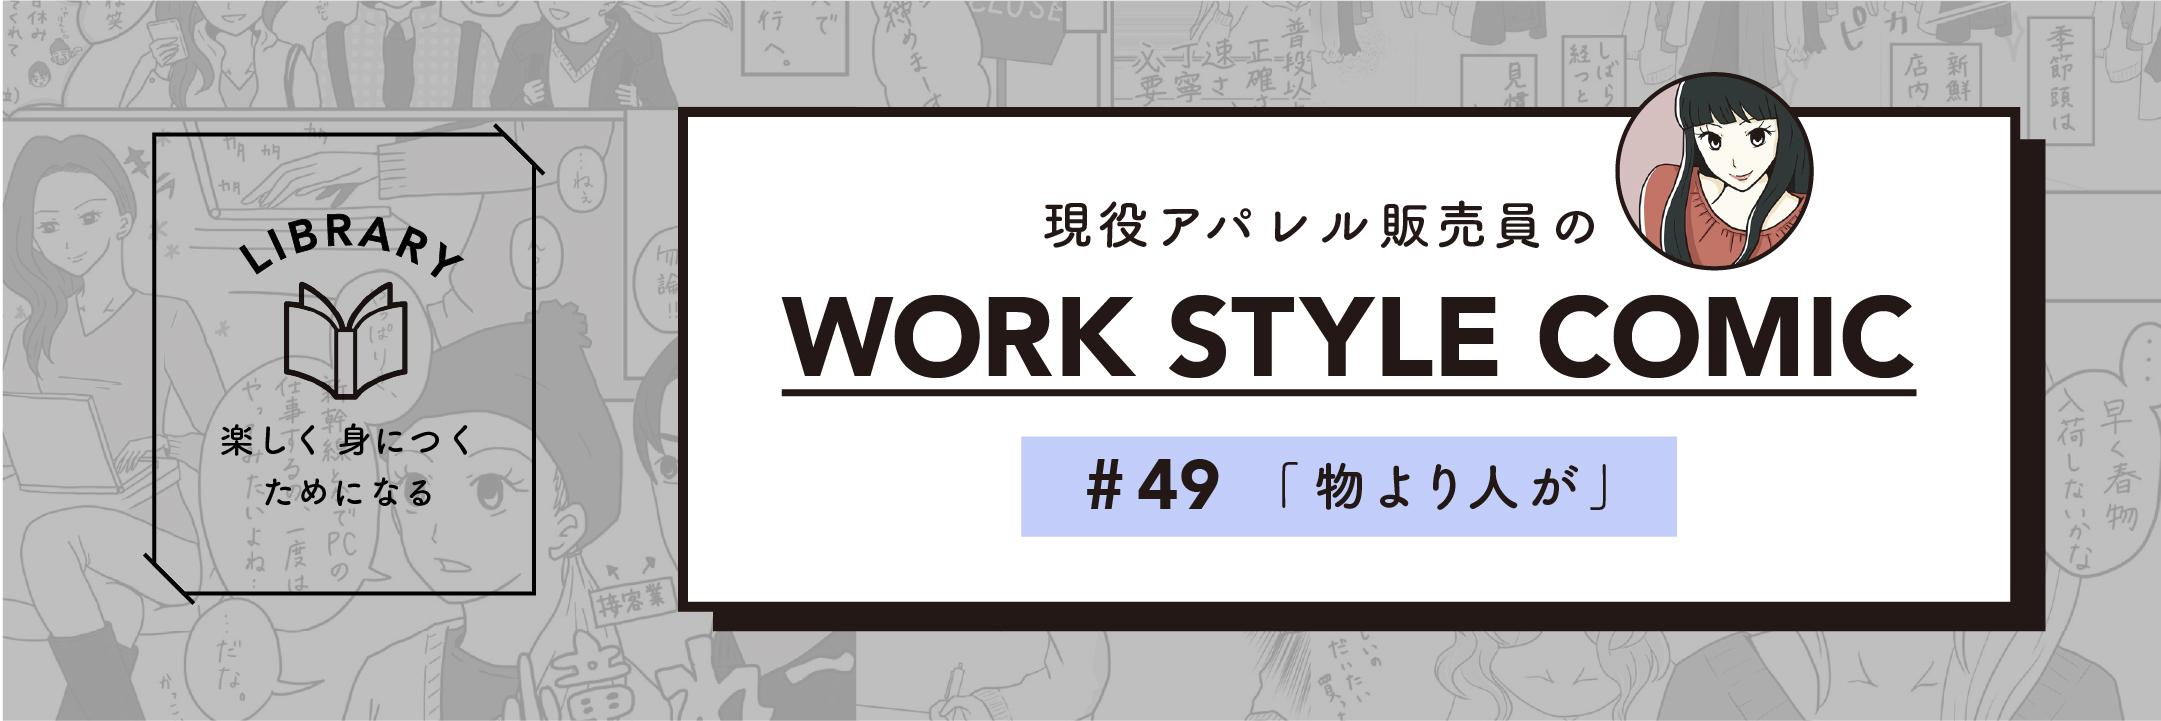 WORK STYLE COMIC49